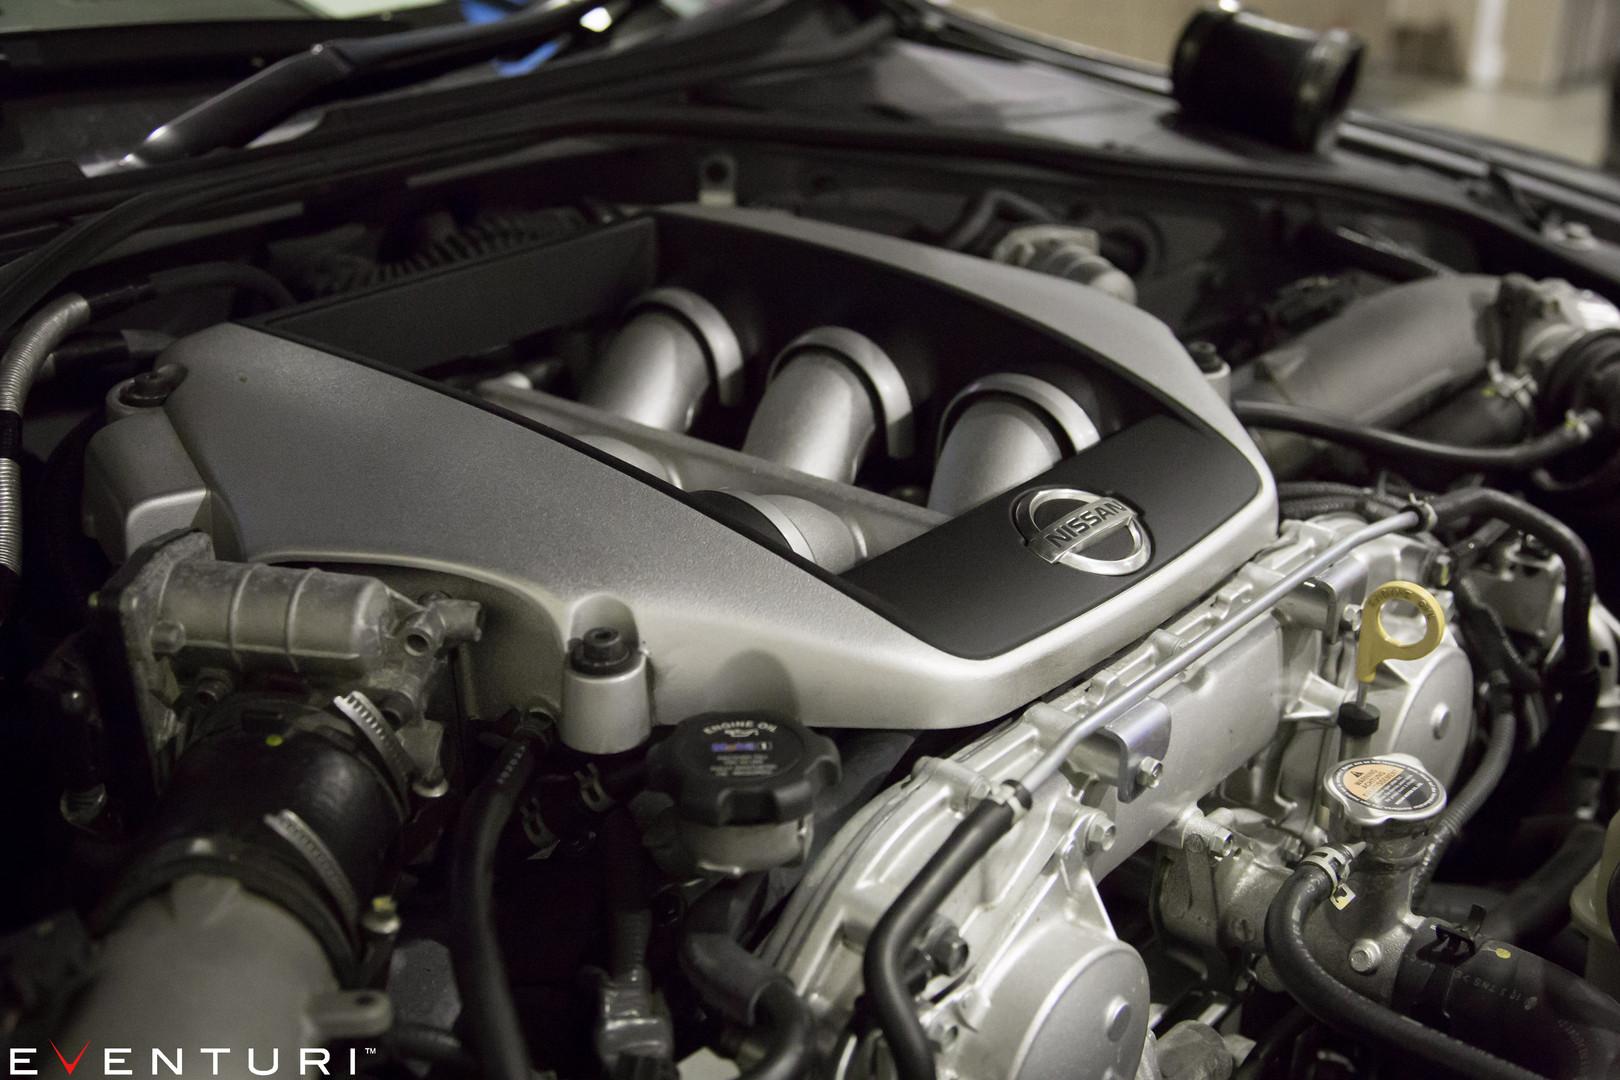 3.5 liter engine from GTR